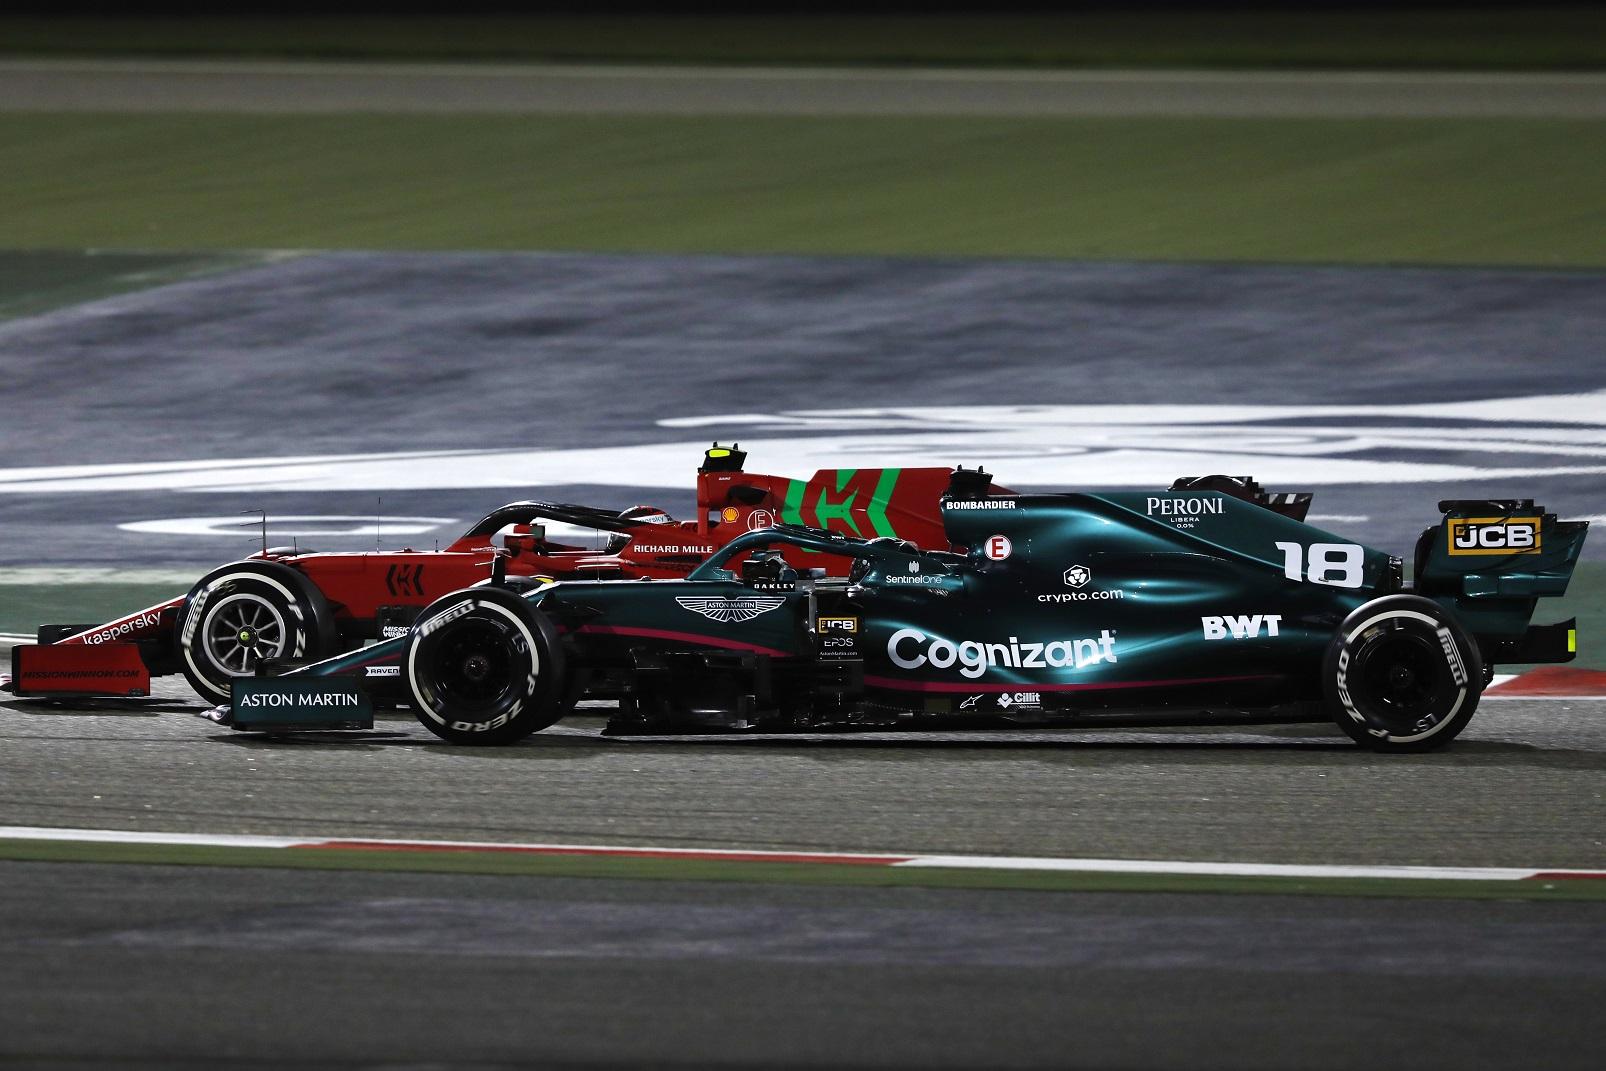 H πανδημία απειλεί το αρχικό πρόγραμμα της Formula 1